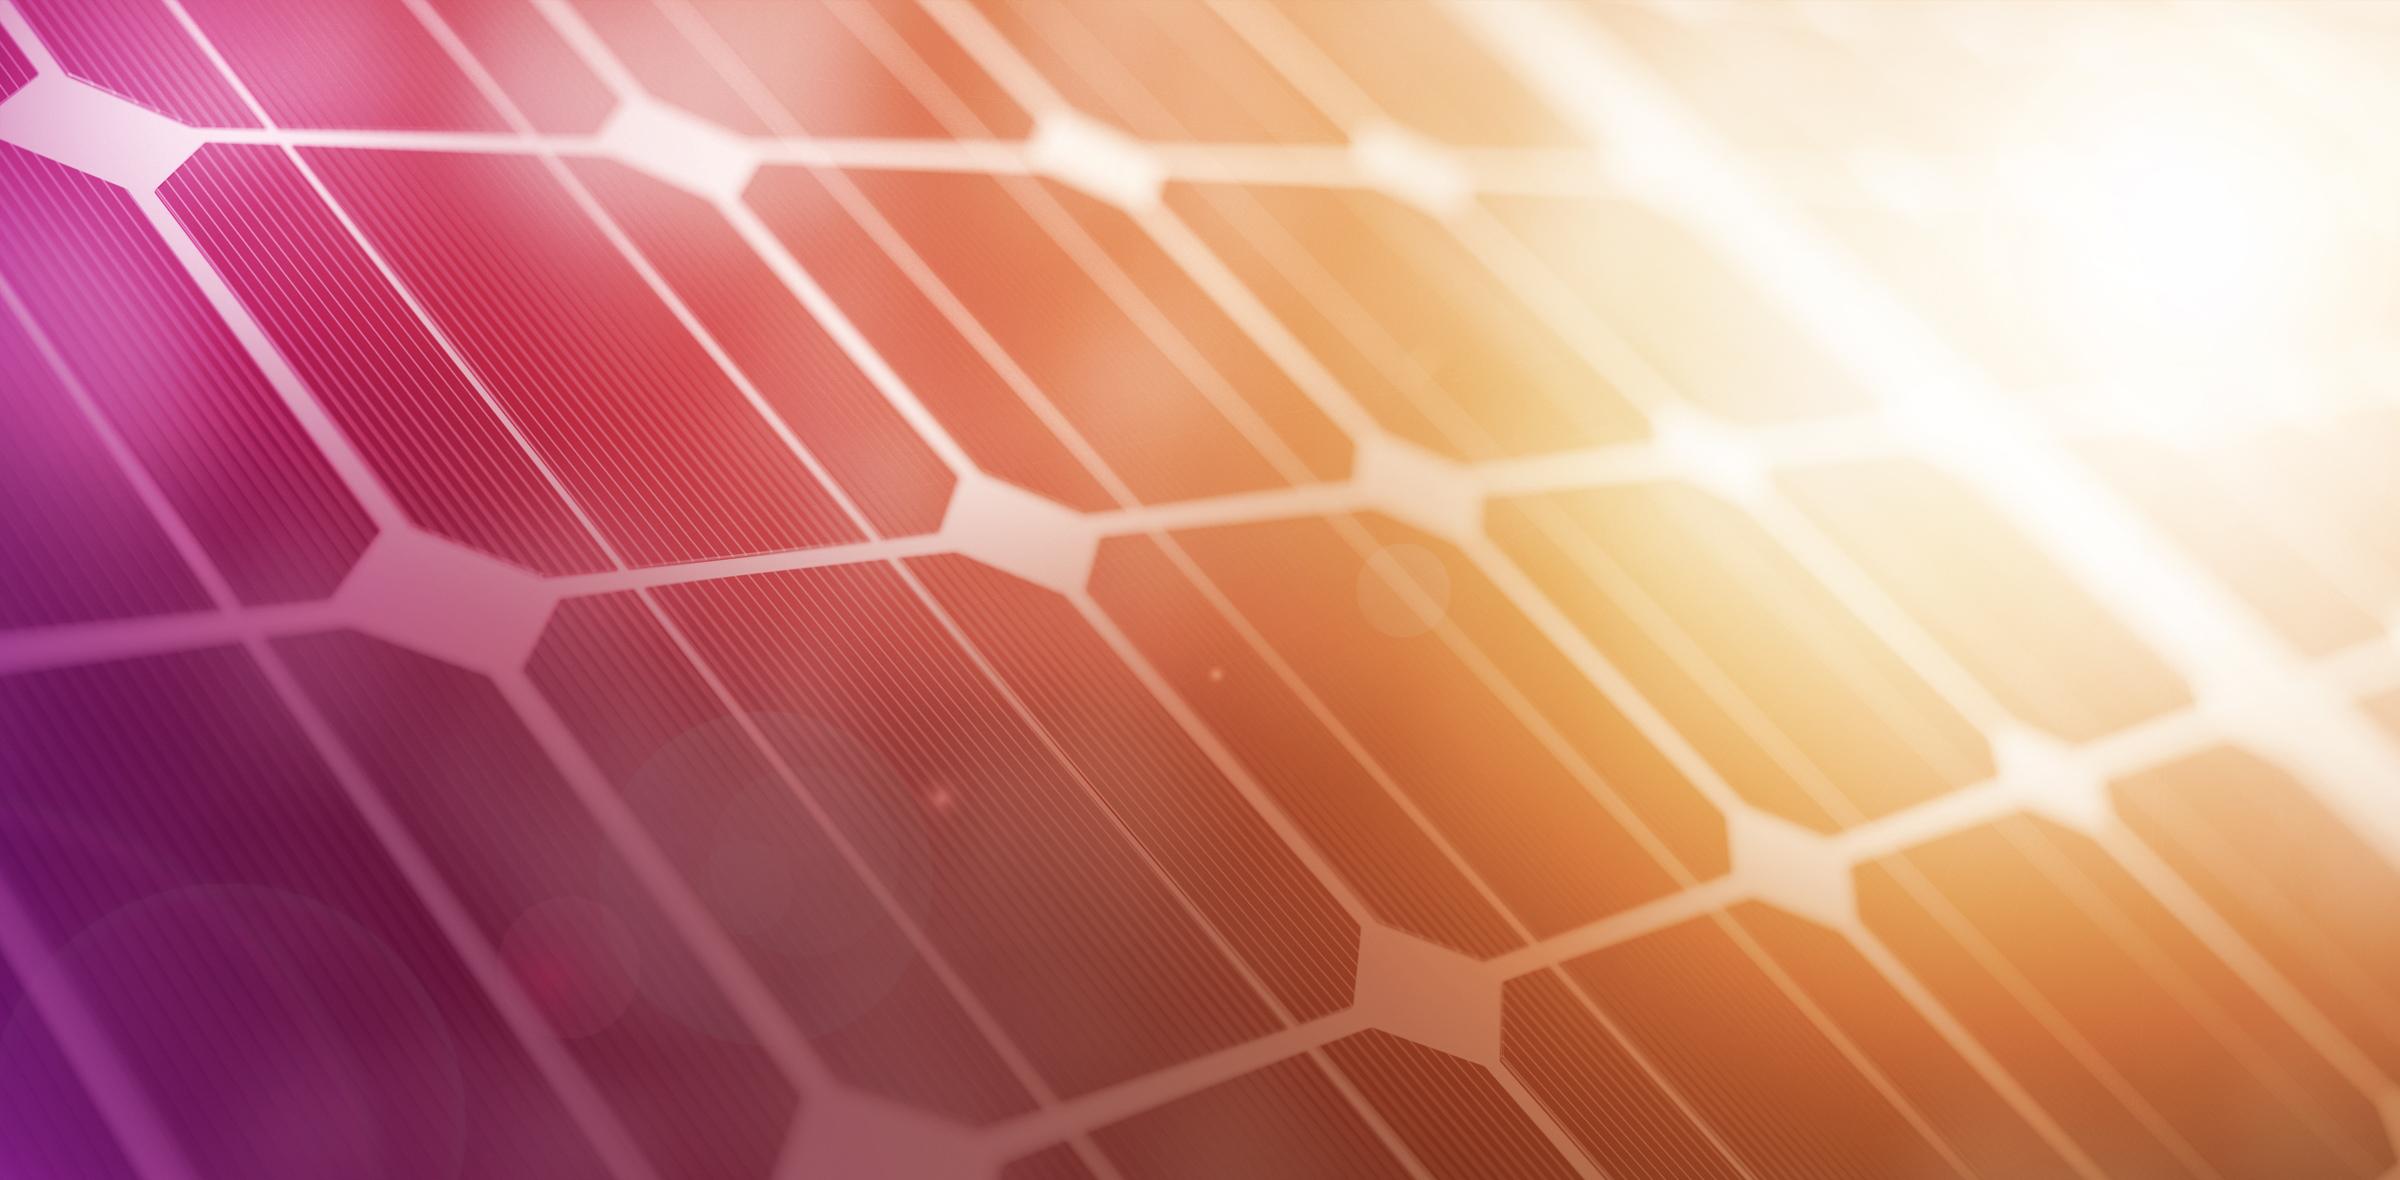 Stylized closeup of a solar panel.